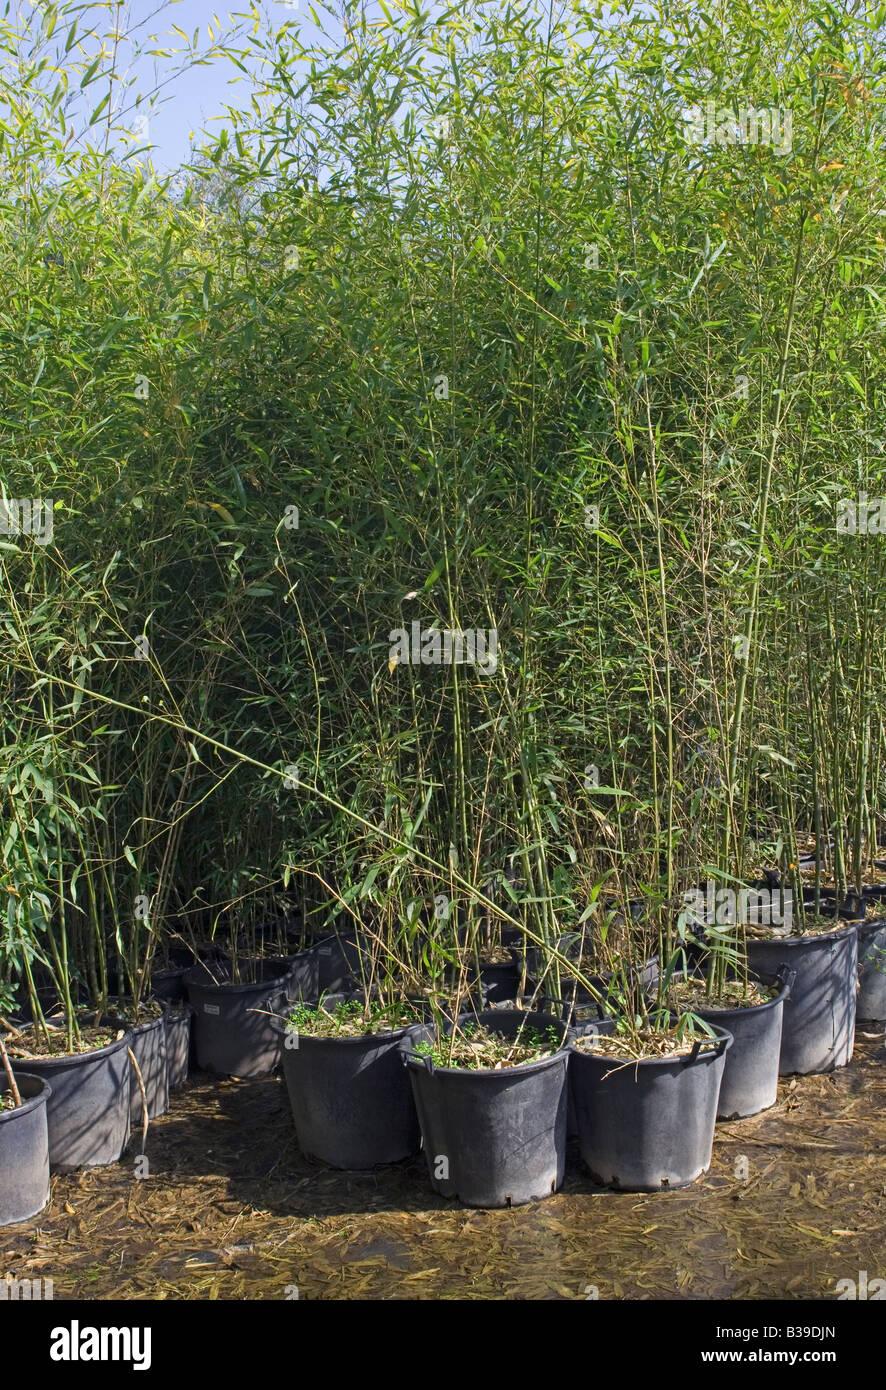 Bambus Pflanzen In Topfen In Baumschule Stockfoto Bild 19262621